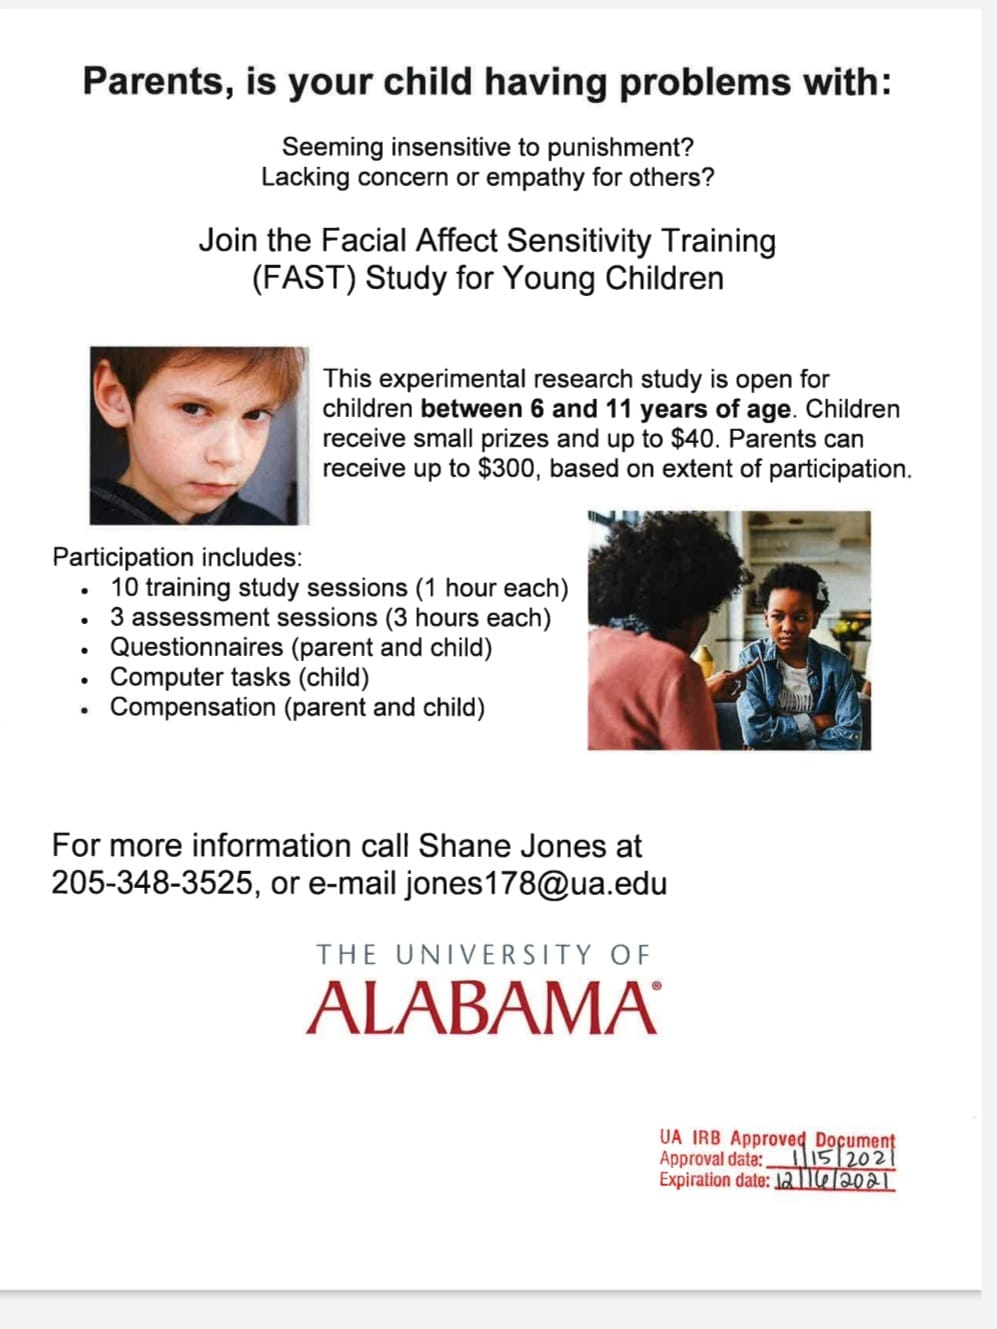 Facial Effect Sensitivity Training